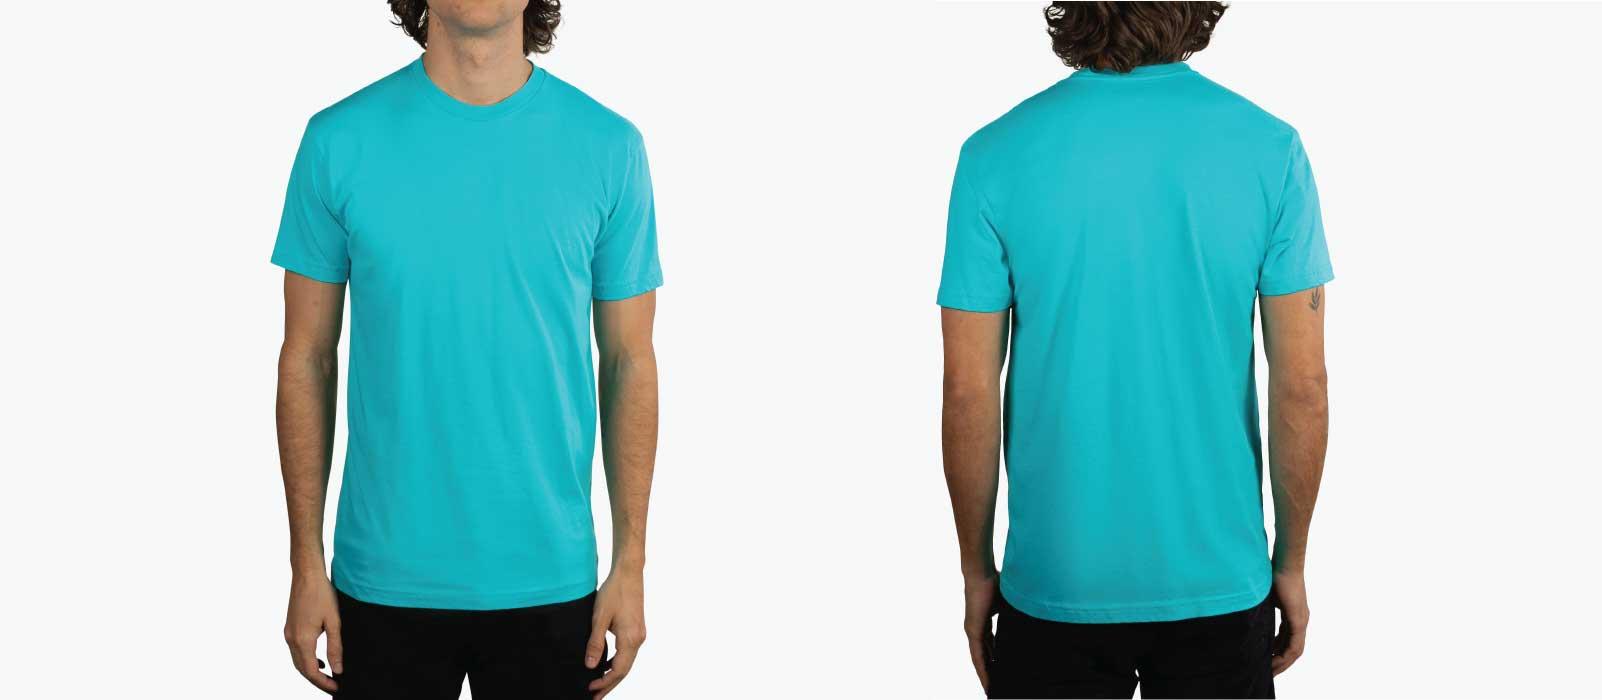 front and back image of man wearing tahiti blue t-shirt